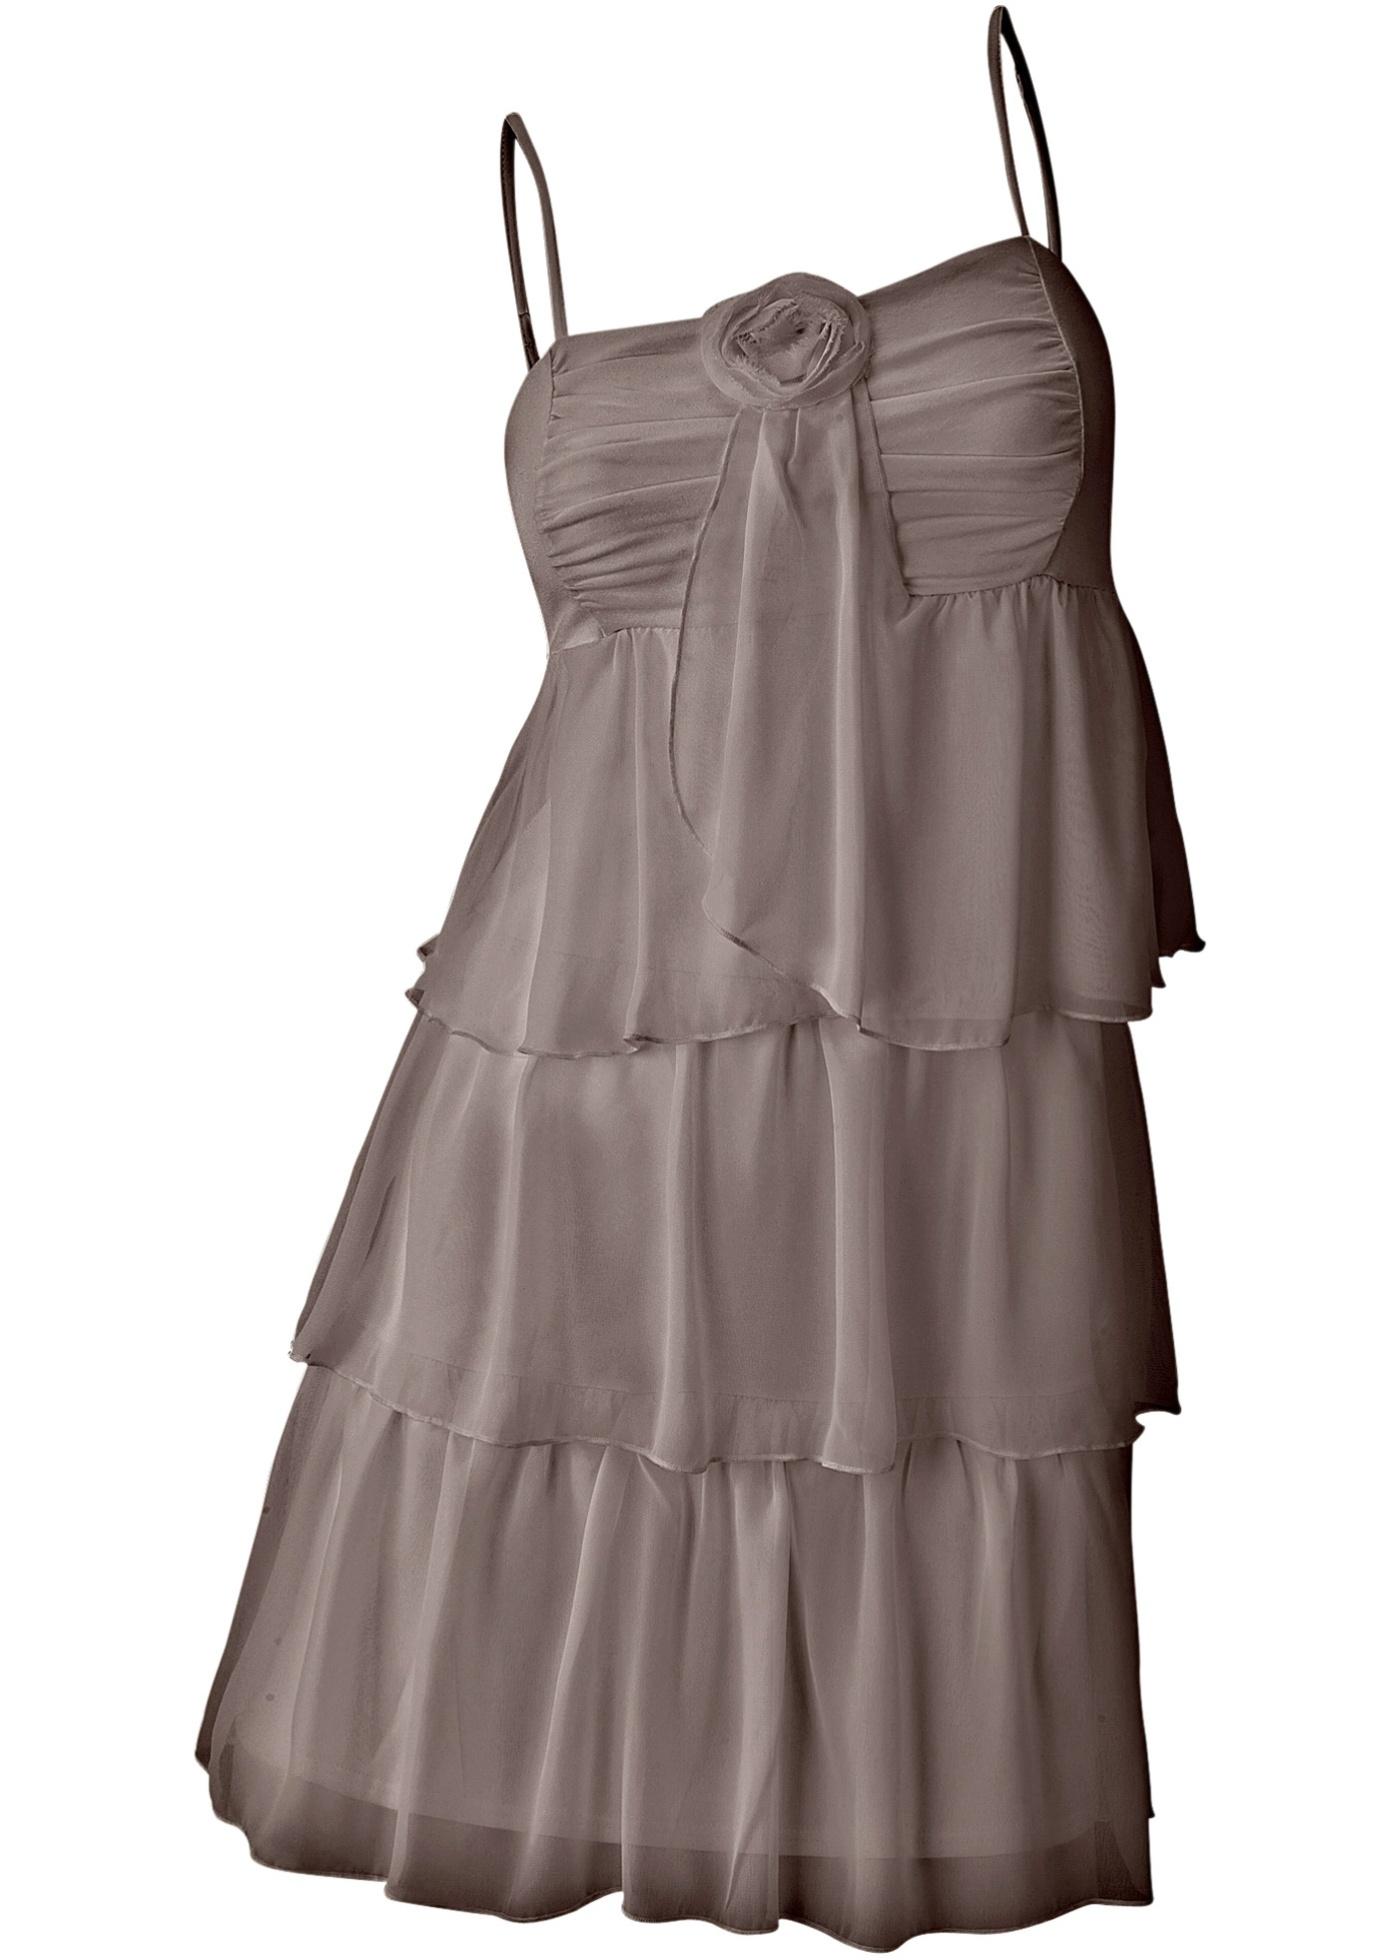 robe avec dentelle pas cher reduction robe avec dentelle comparer les prix avec captainprice. Black Bedroom Furniture Sets. Home Design Ideas